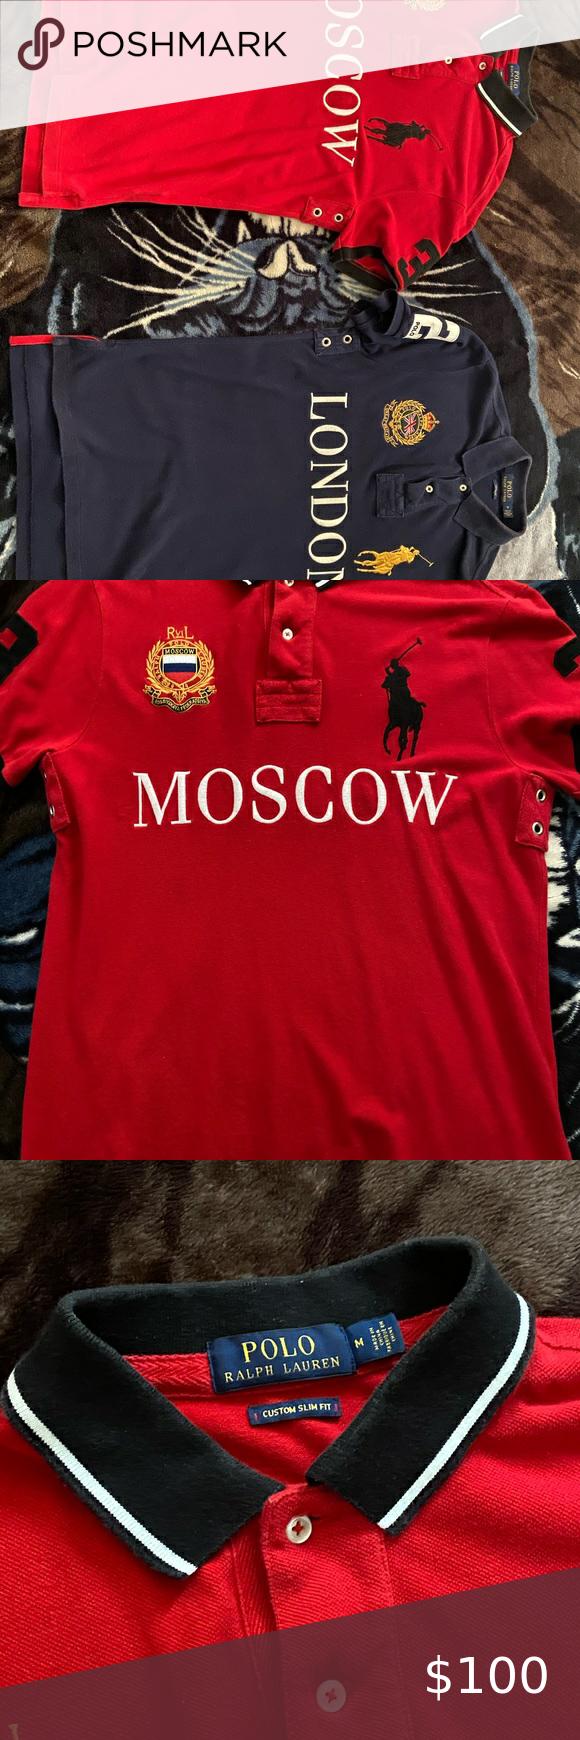 Ralph Lauren Polo Shirts In 2020 Ralph Lauren Polo Shirts Polo Shirt Polo Ralph Lauren